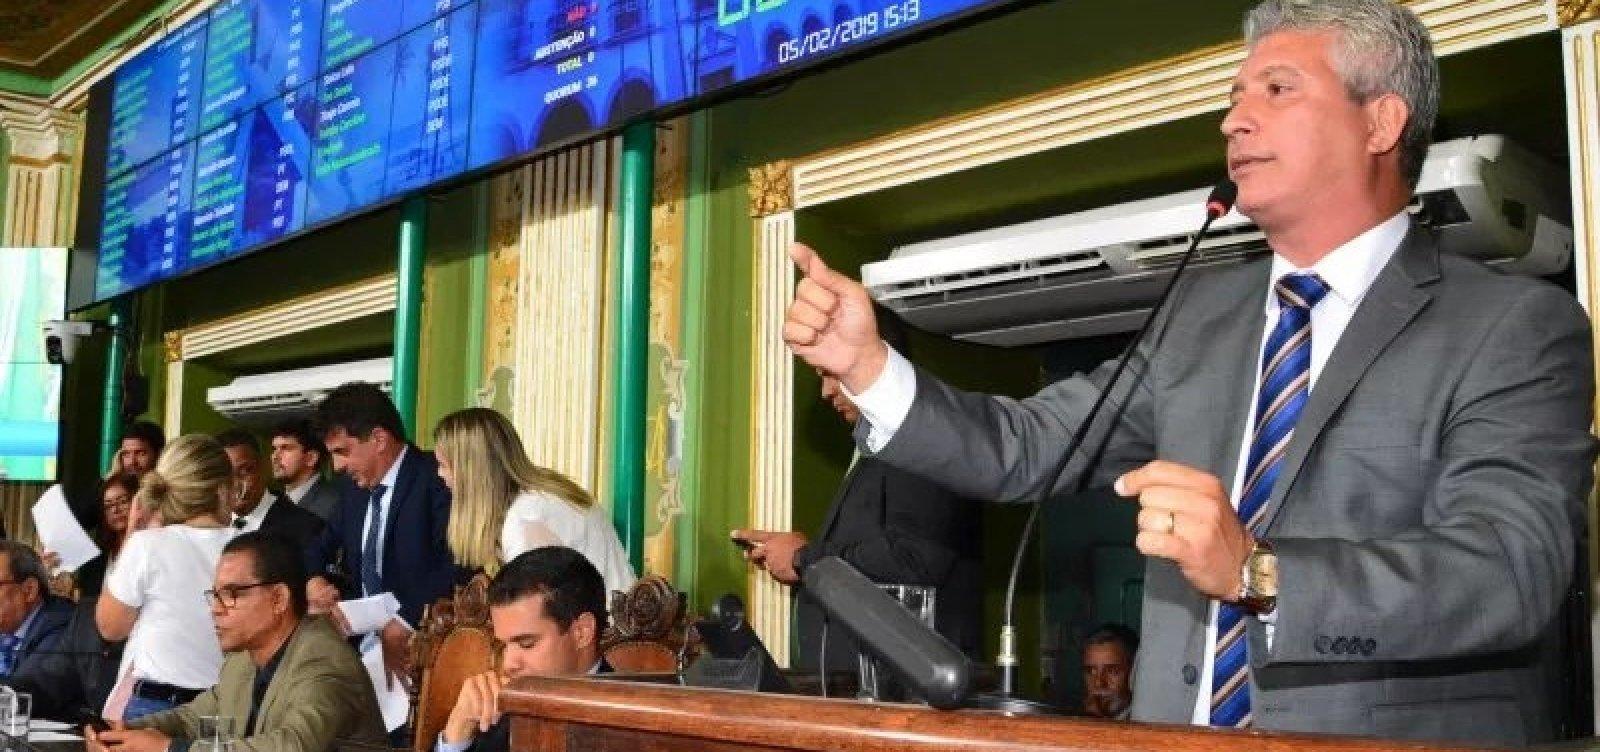 Carballal entrega vice-liderança na Câmara de Salvador após Neto vetar seu projeto